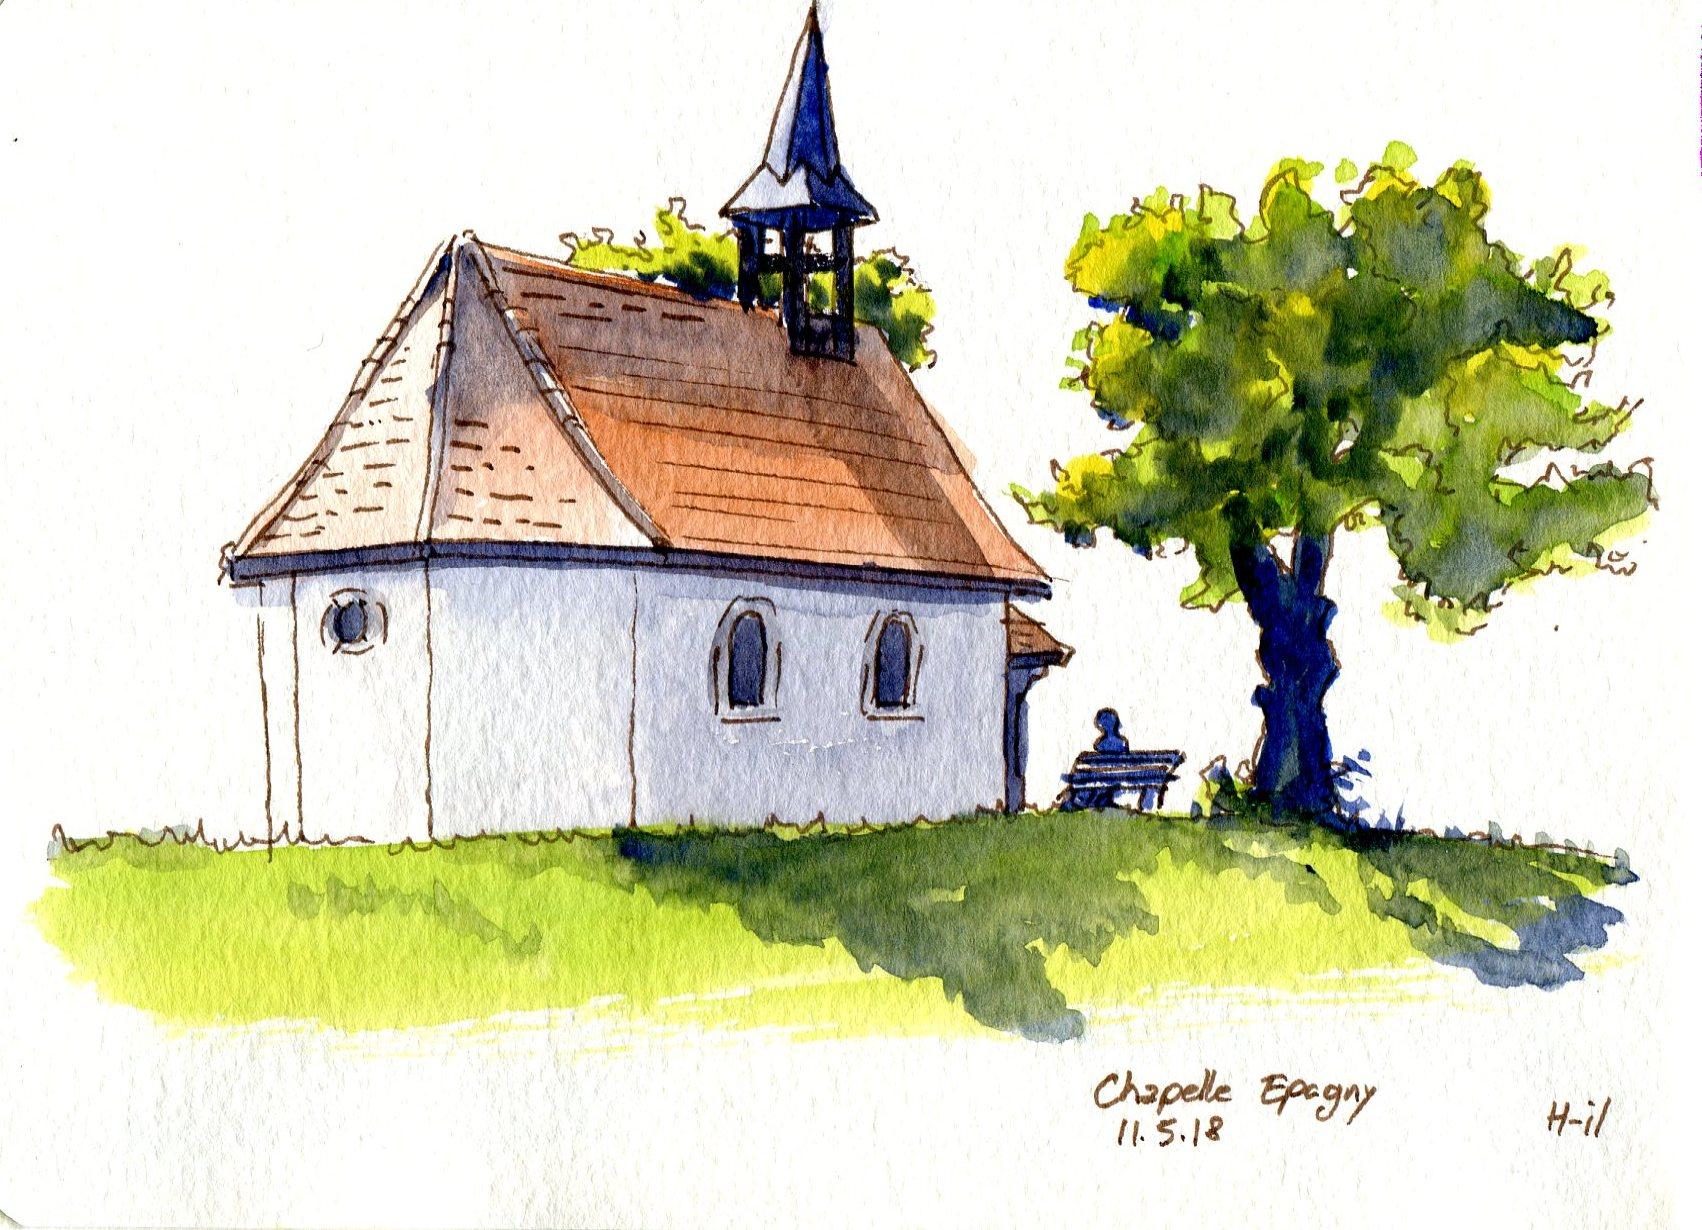 Chapelle Epagny